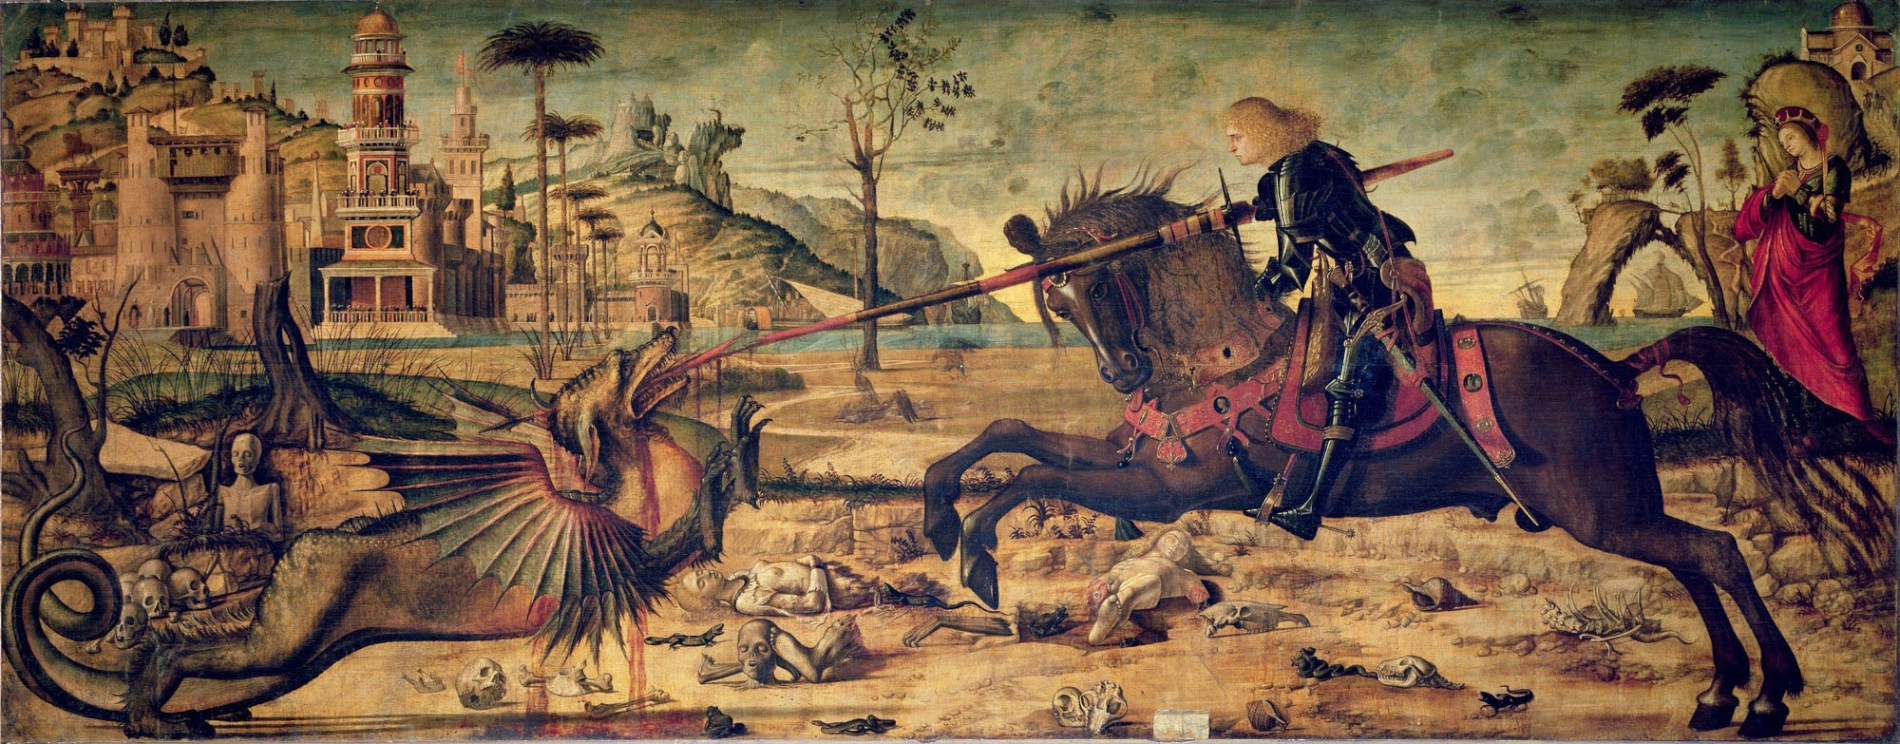 carpacciost-george-killing-the-dragon-1507-v2.jpg